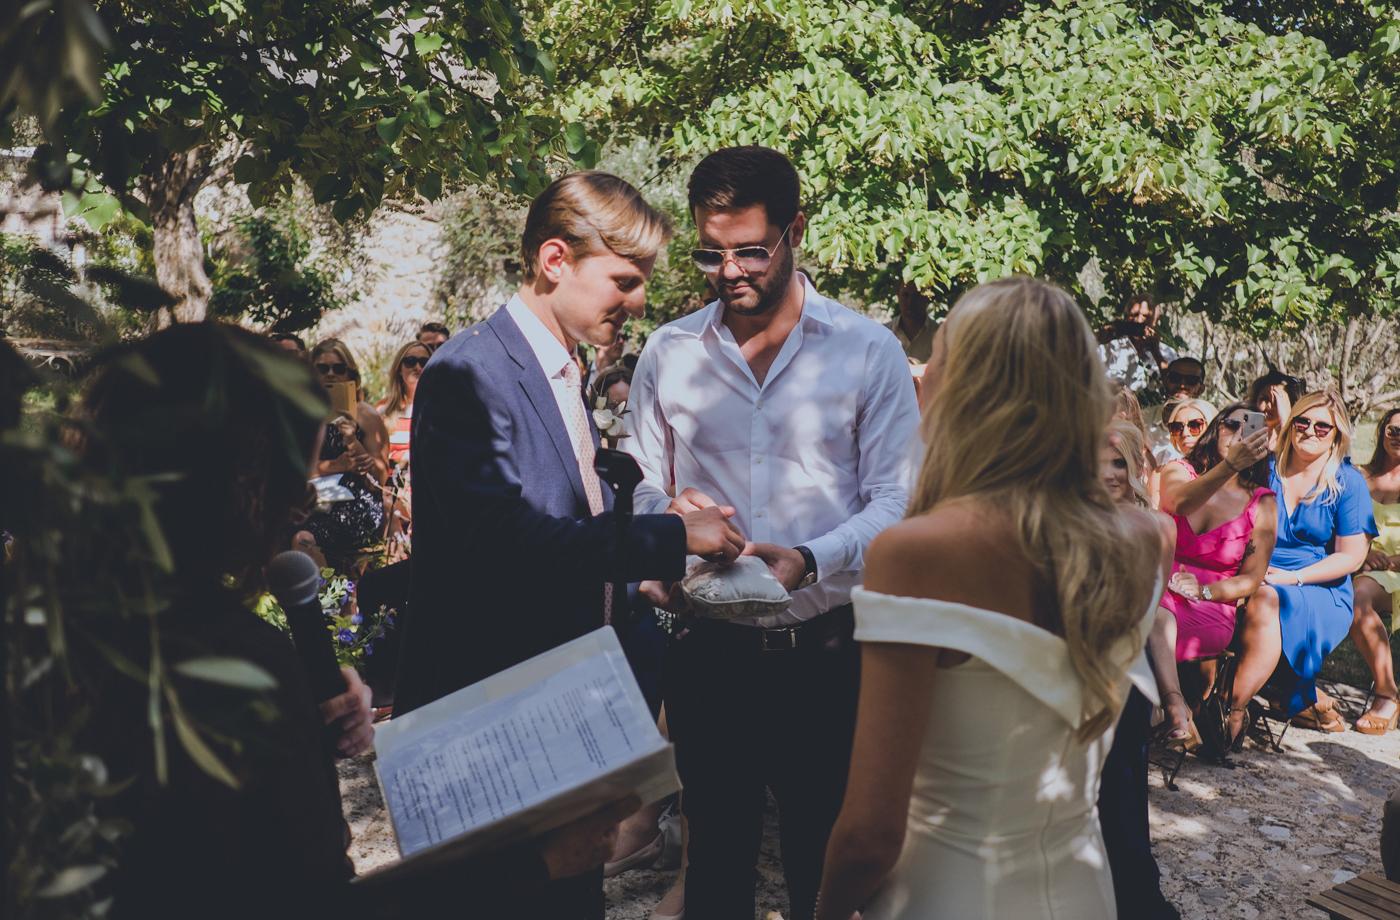 Outdoor Wedding in France